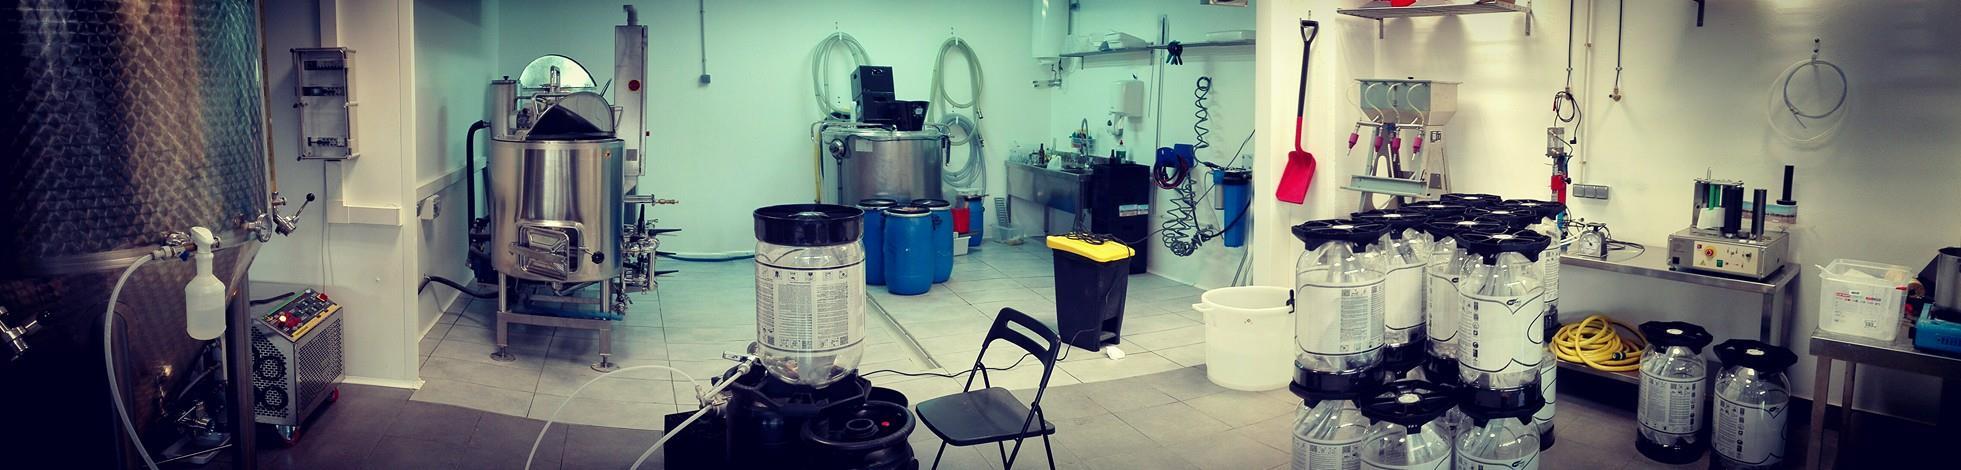 Fábrica de Zarautz Beer Company